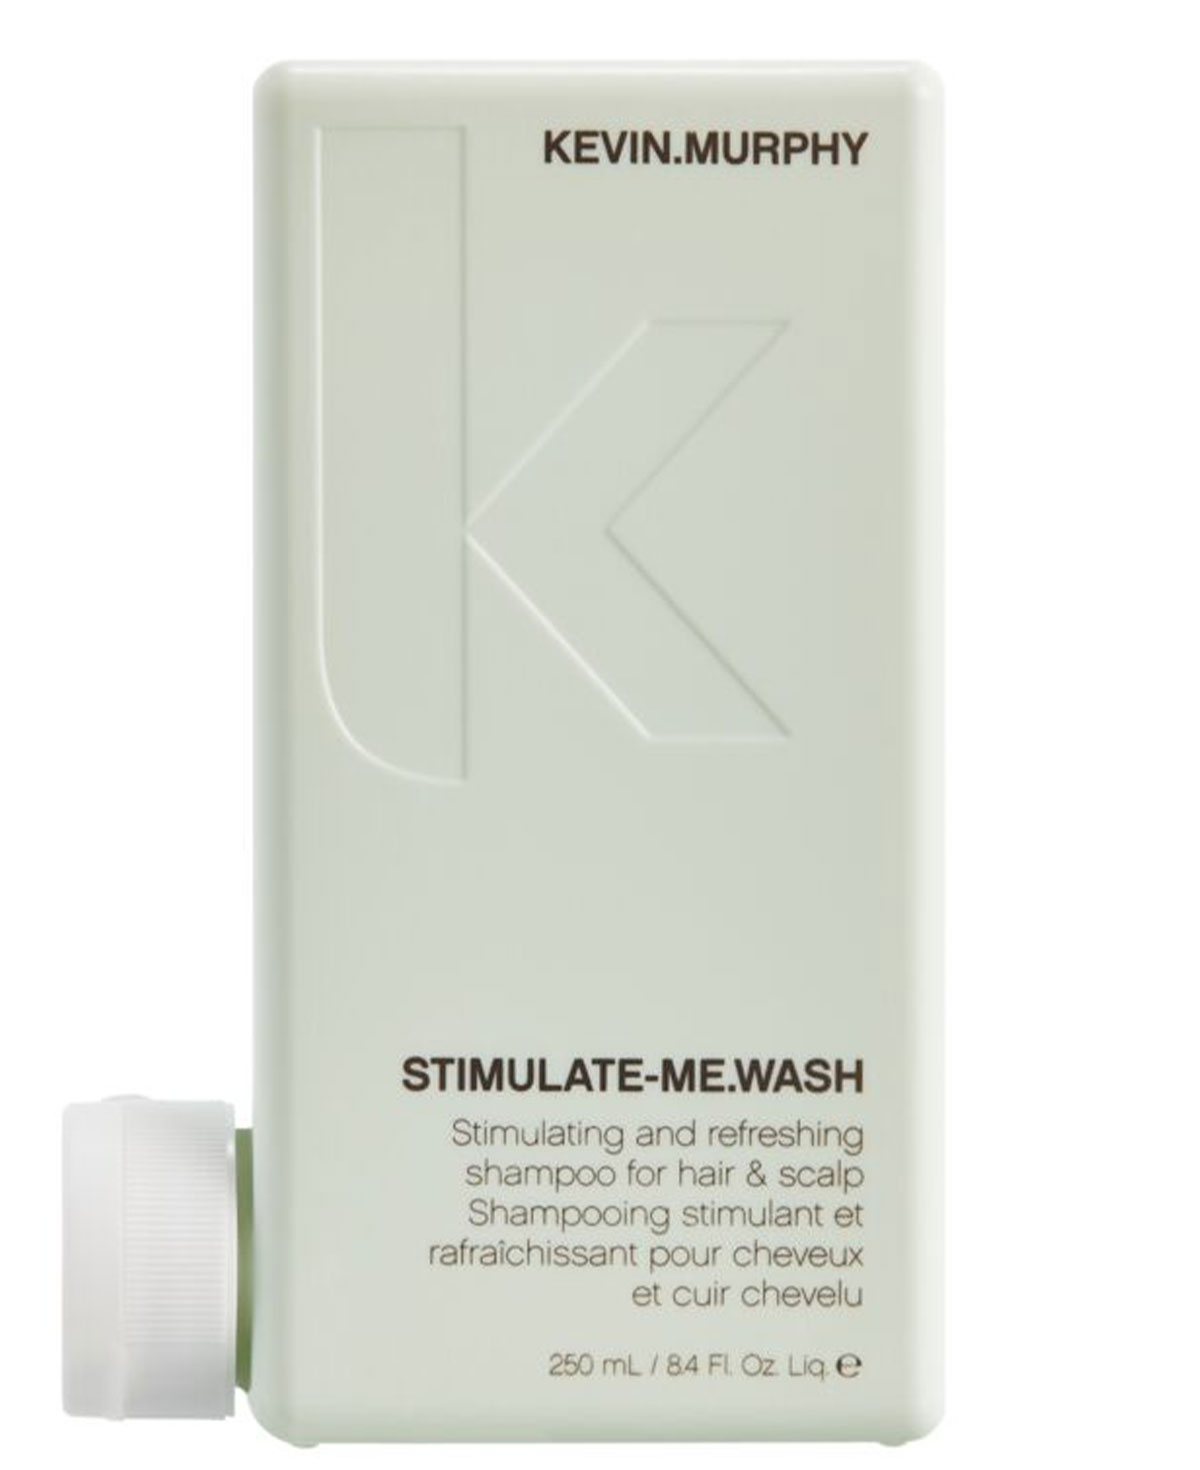 Kevin.Murphy STIMULATE-ME.WASH 250ml